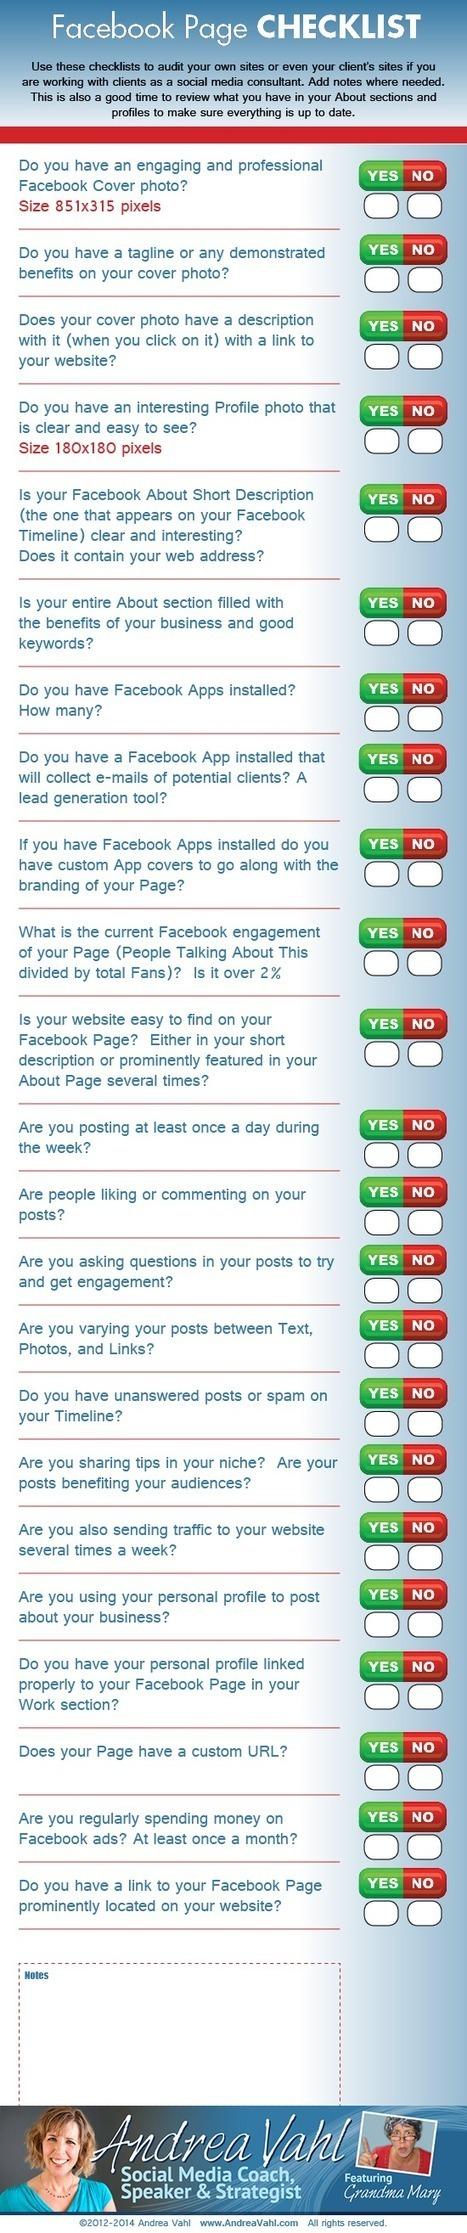 Facebook Page Checklist [Infographic] | Social Media Marketing Superstars | Scoop.it